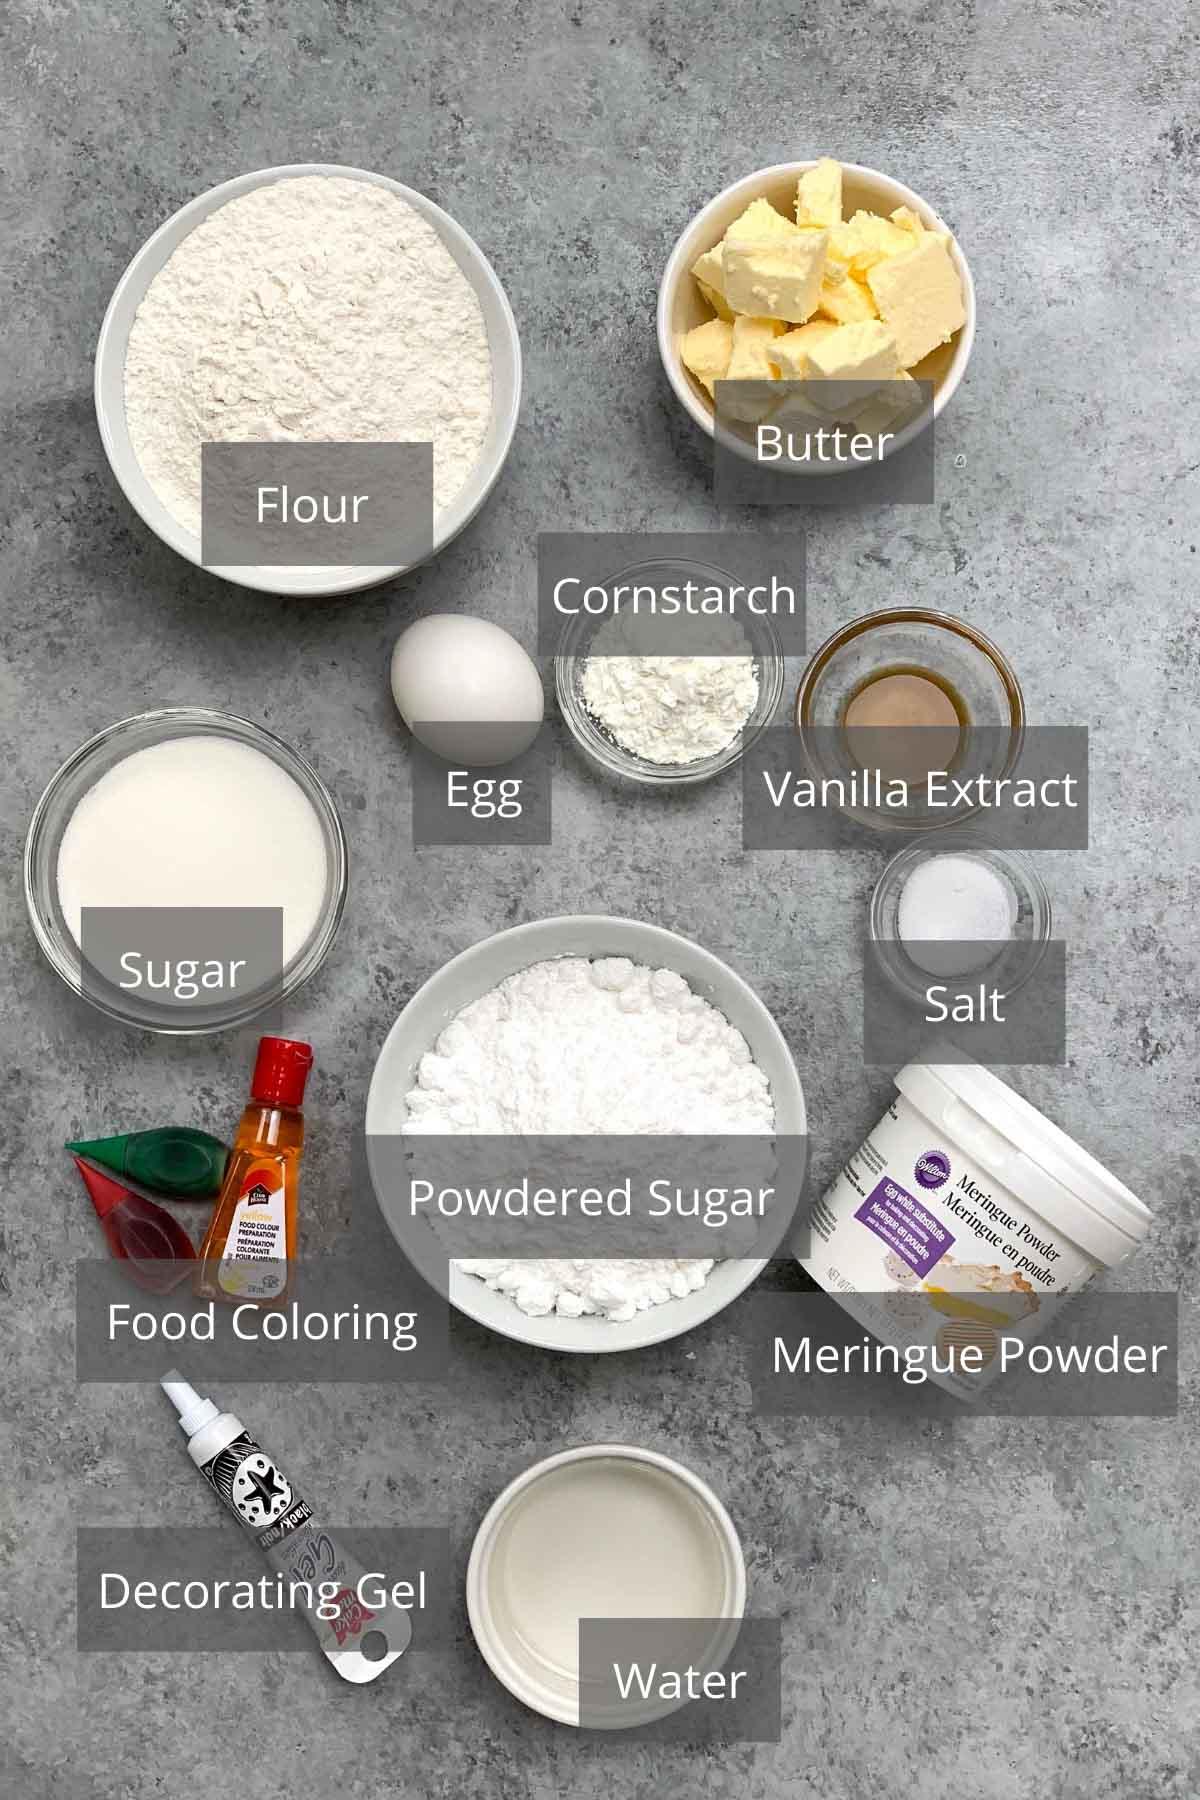 Ingredients for making baby Yoda cookies.